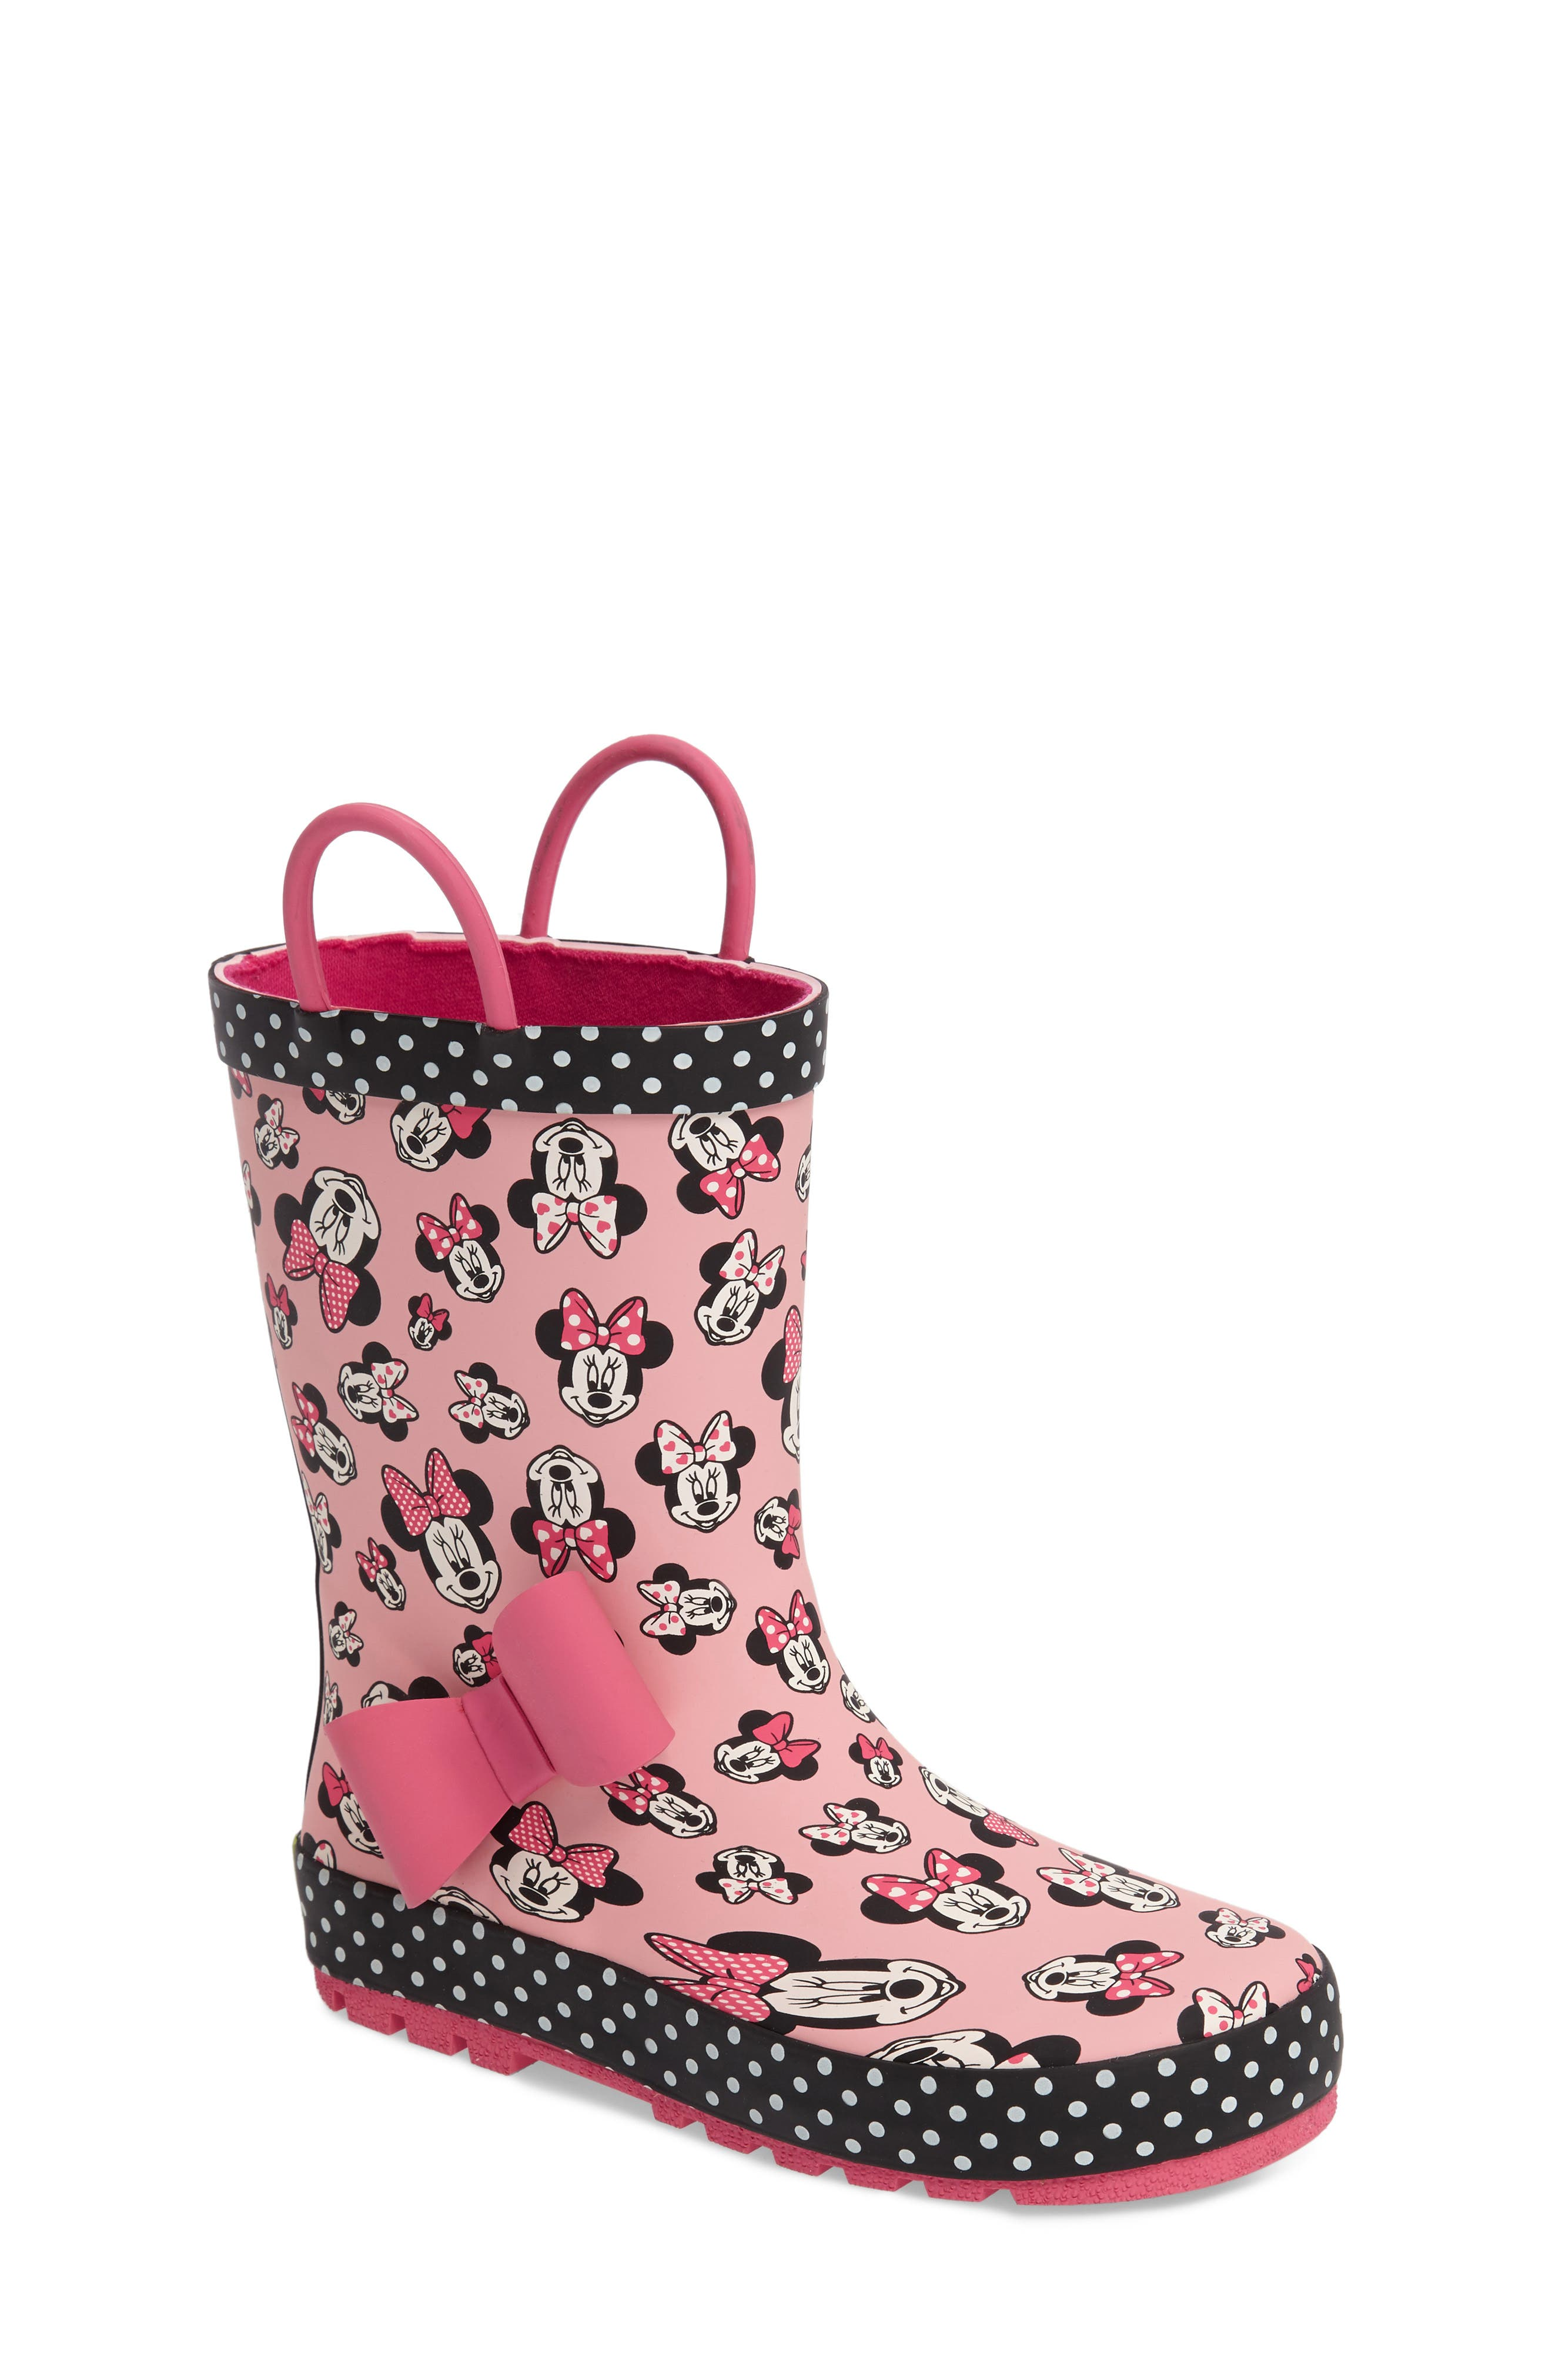 Western Chief Disney® Minnie Mouse Waterproof Rain Boot (Walker, Toddler, Little Kid & Big Kid)